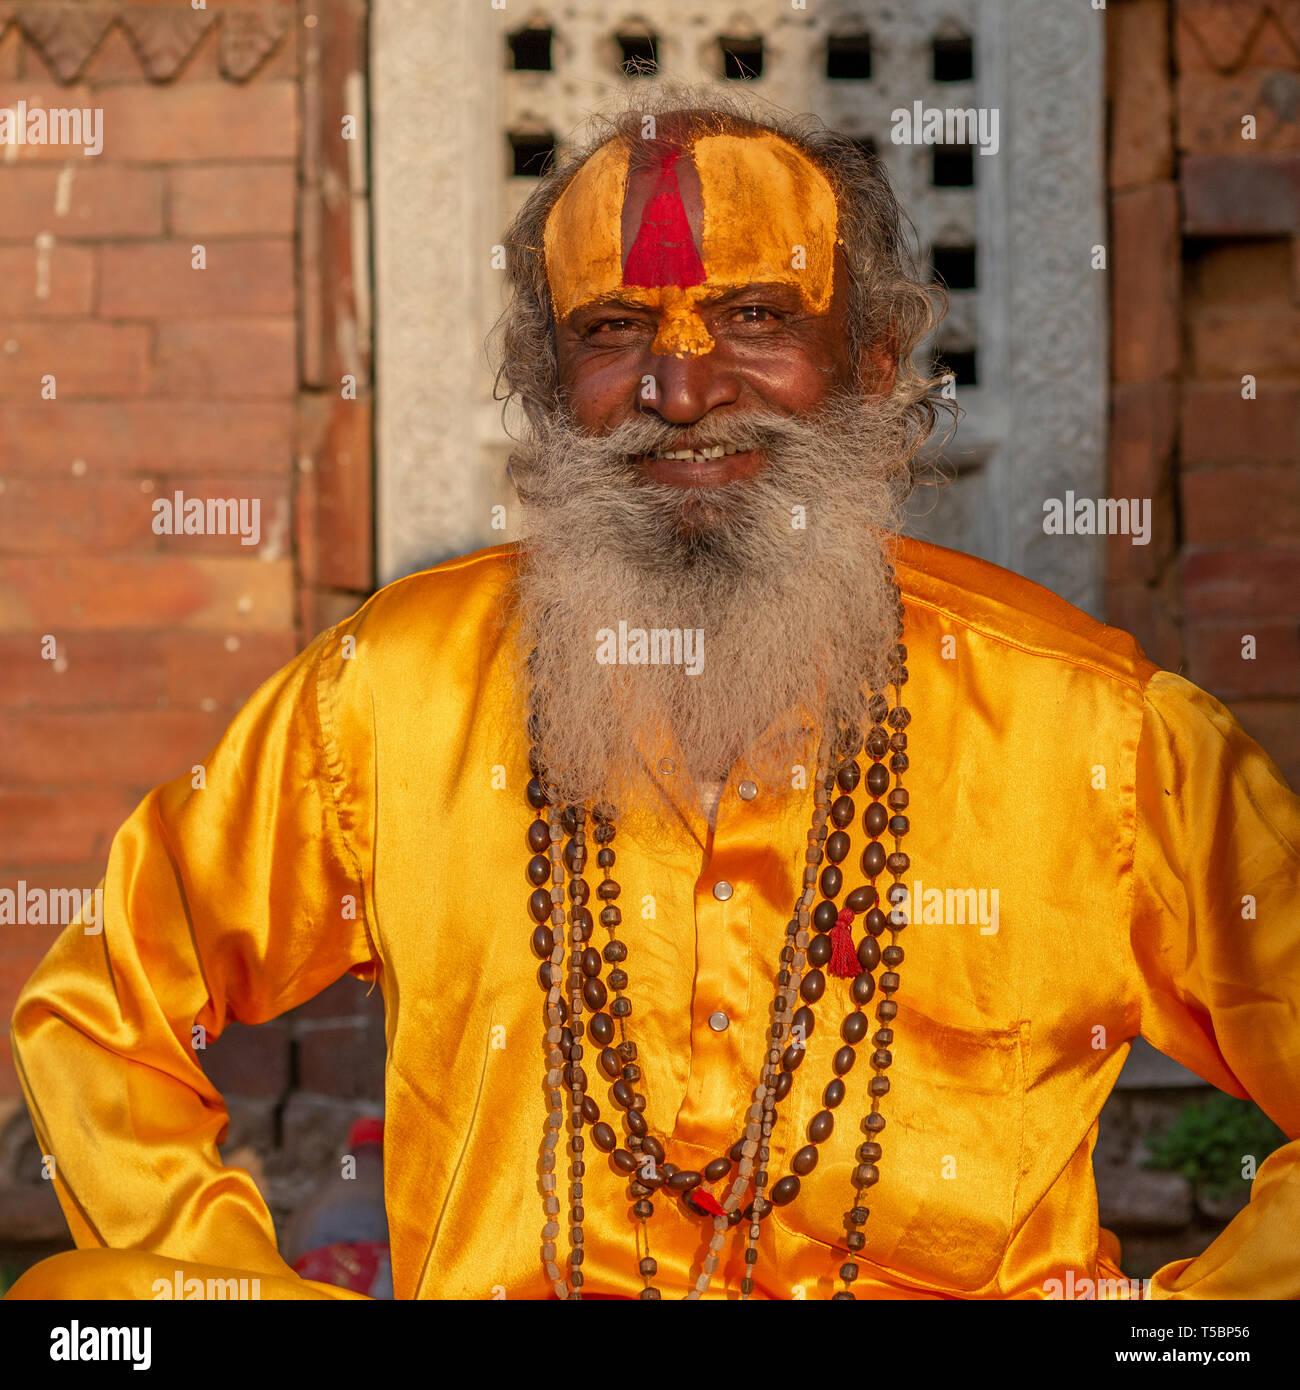 TILGANGA, KATHMANDU, NEPAL - APRIL 2, 2019: one sadhu al dressed in silky saffron yellow clothing - Stock Image